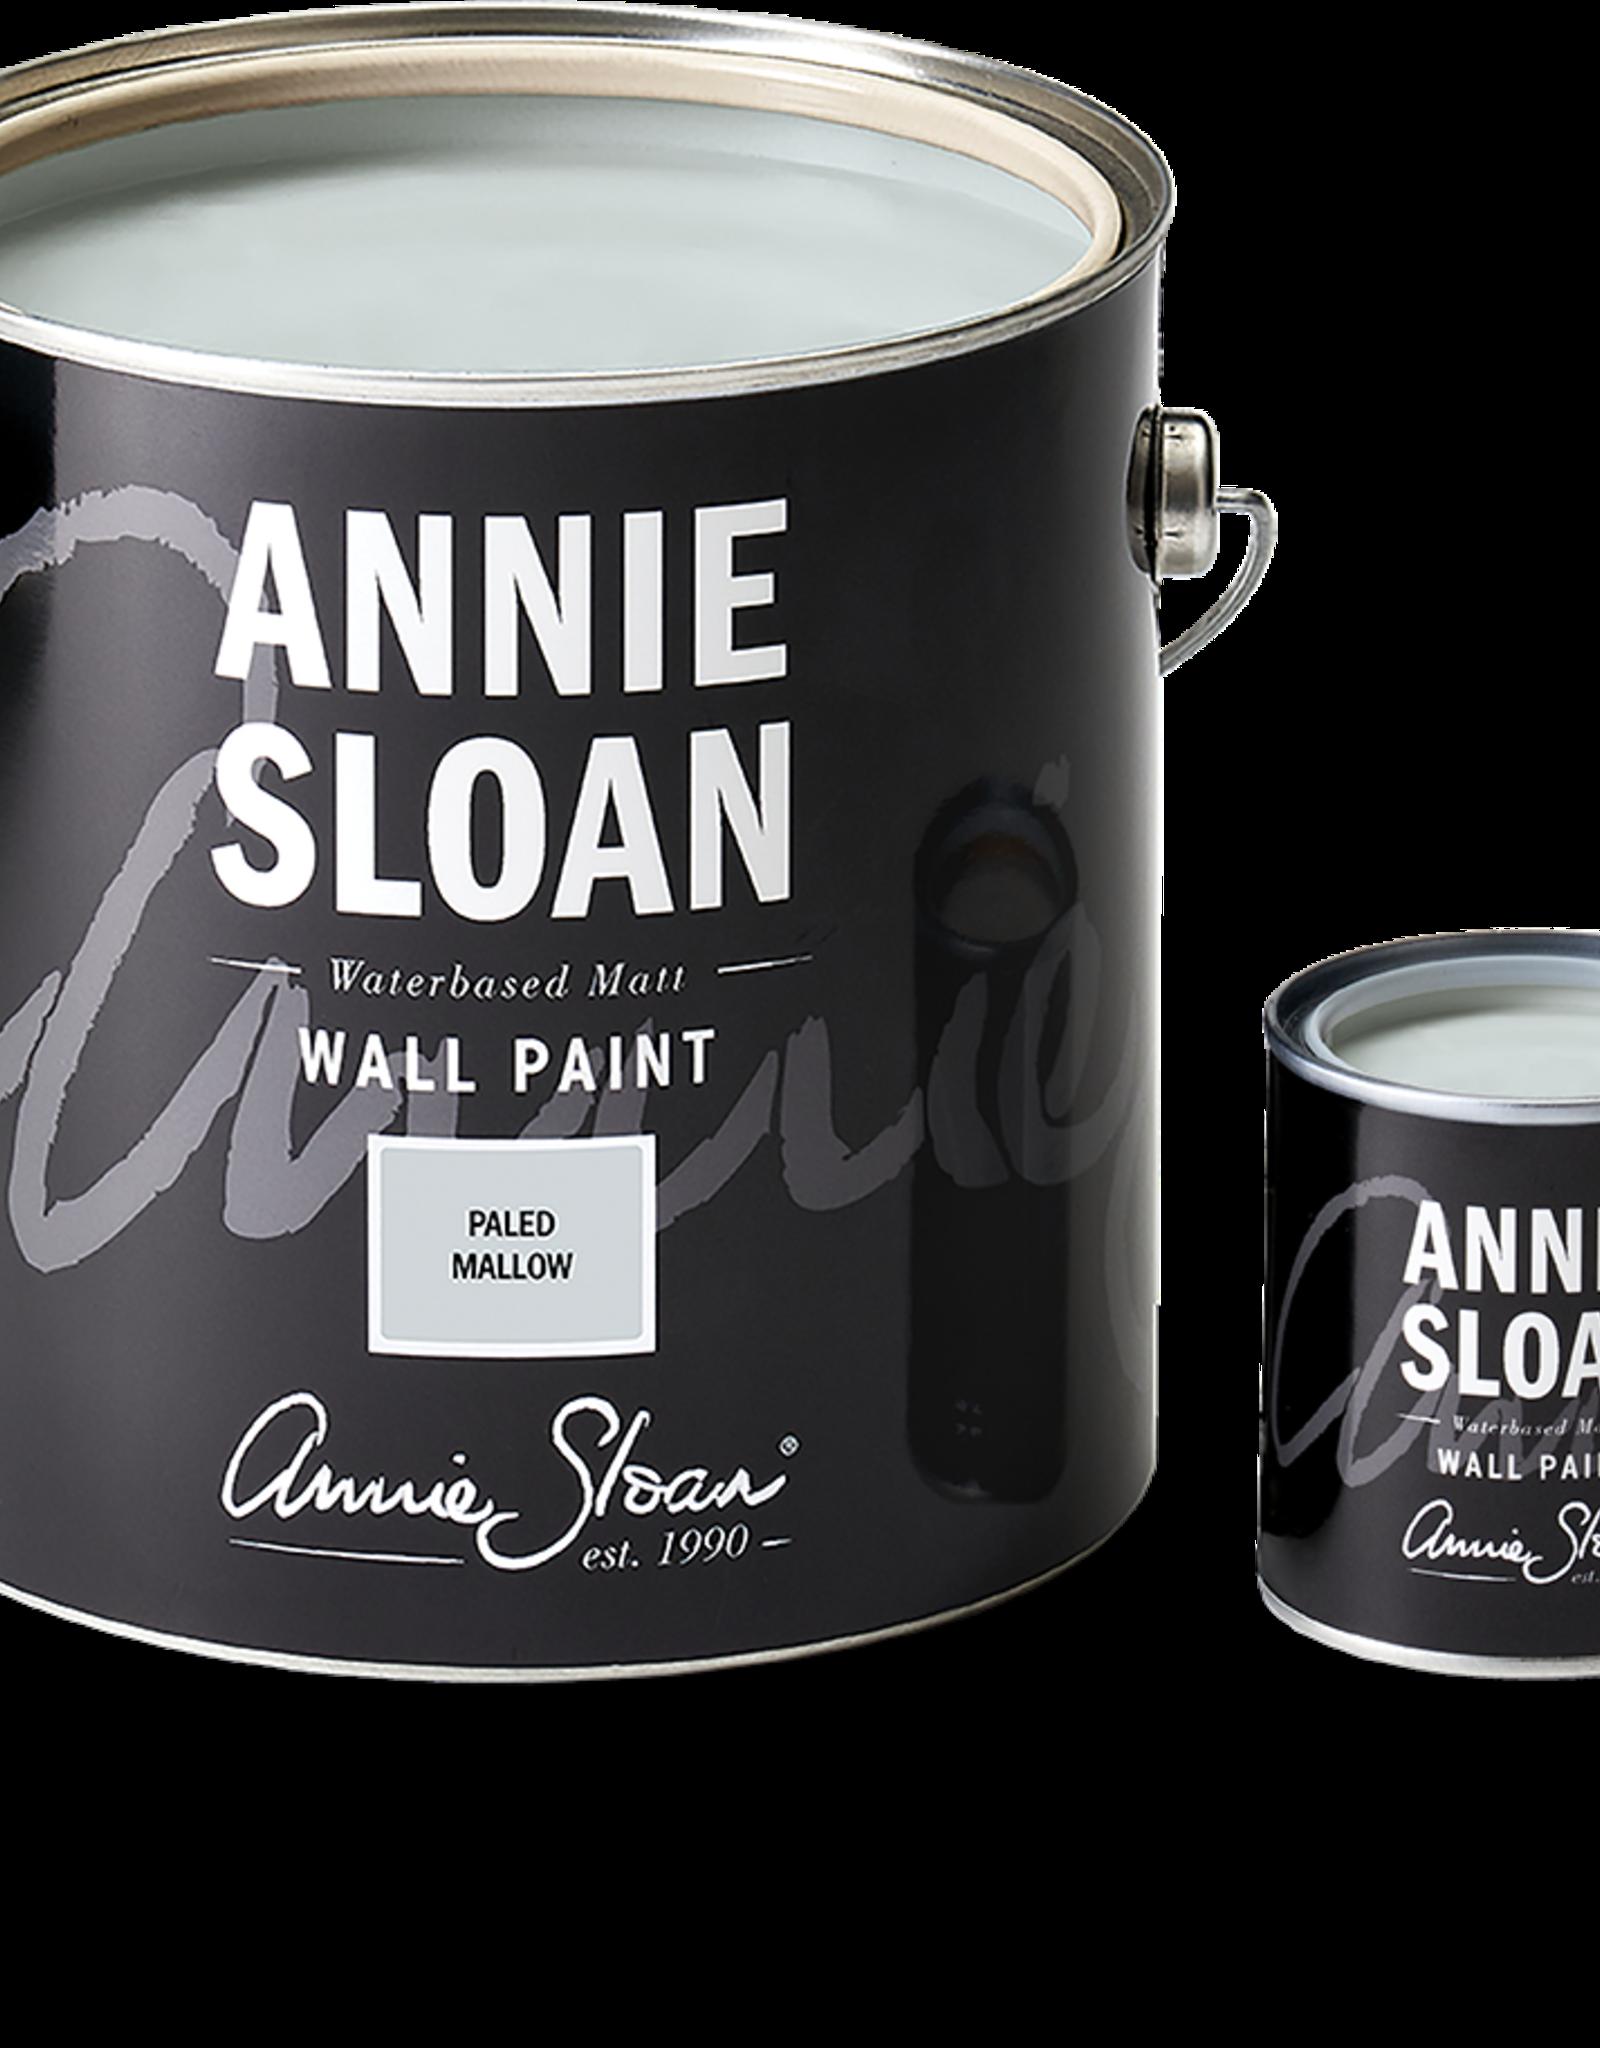 Annie Sloan Krijtverf Annie Sloan, New Wall Paint 2,5 Liter, Paled Mallow